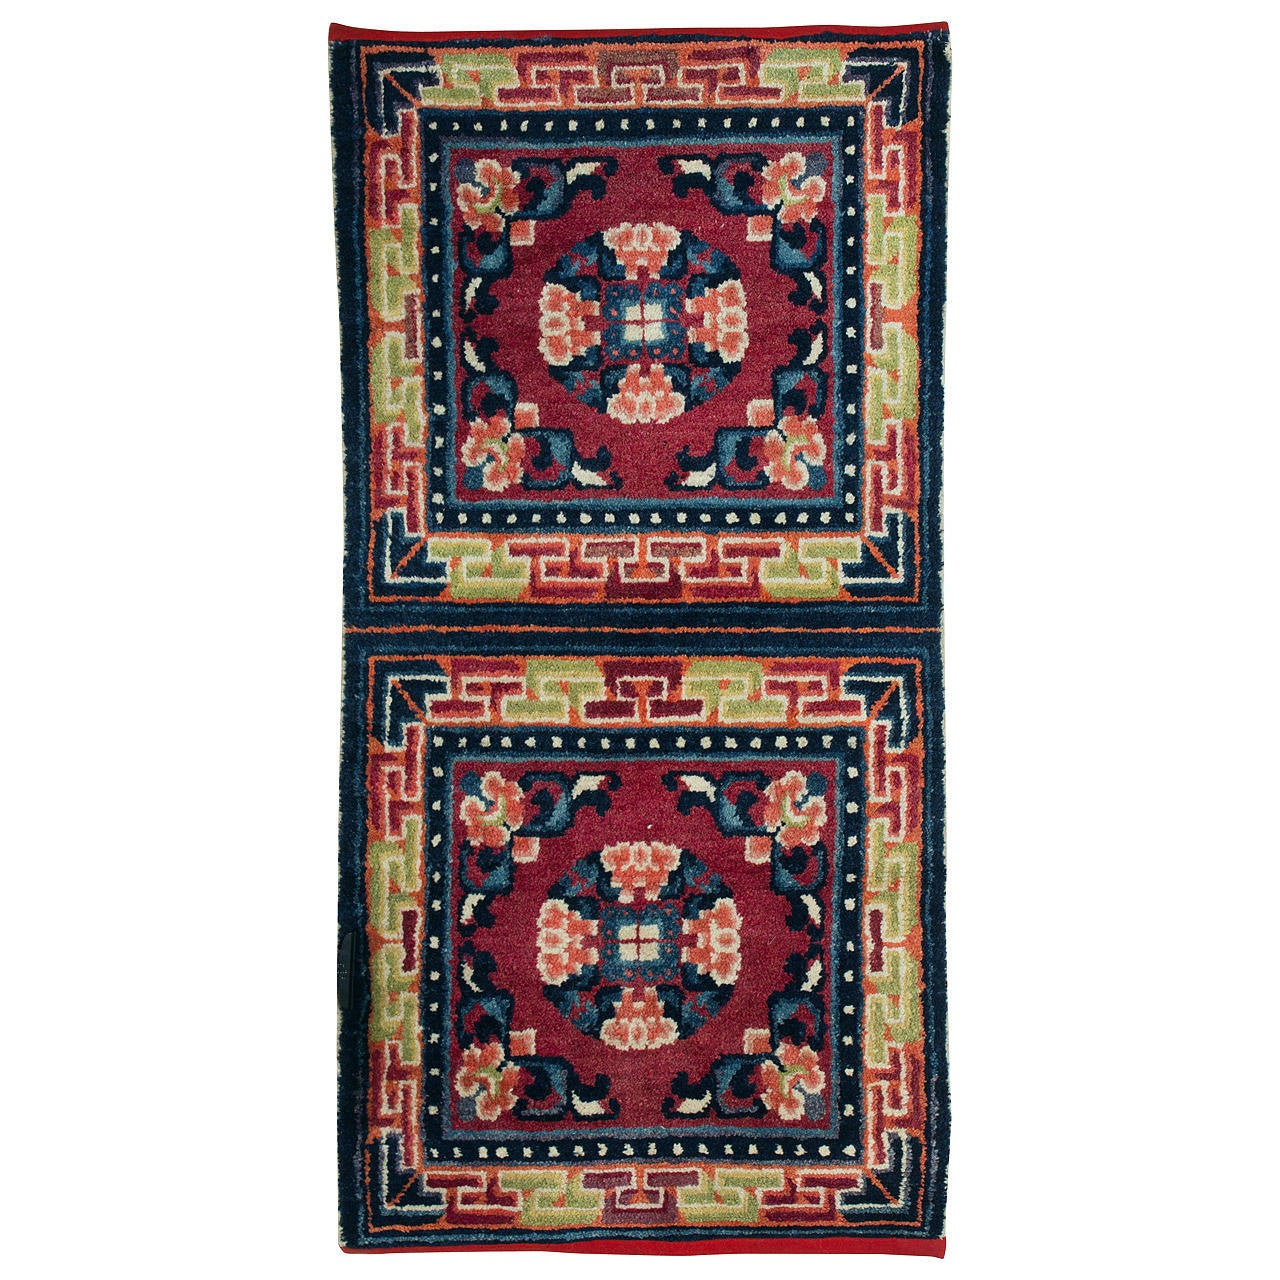 Antique Tibetan Rug: Antique Tibetan Ning Hsia (Ningxia, Ninghsia) Double Monk